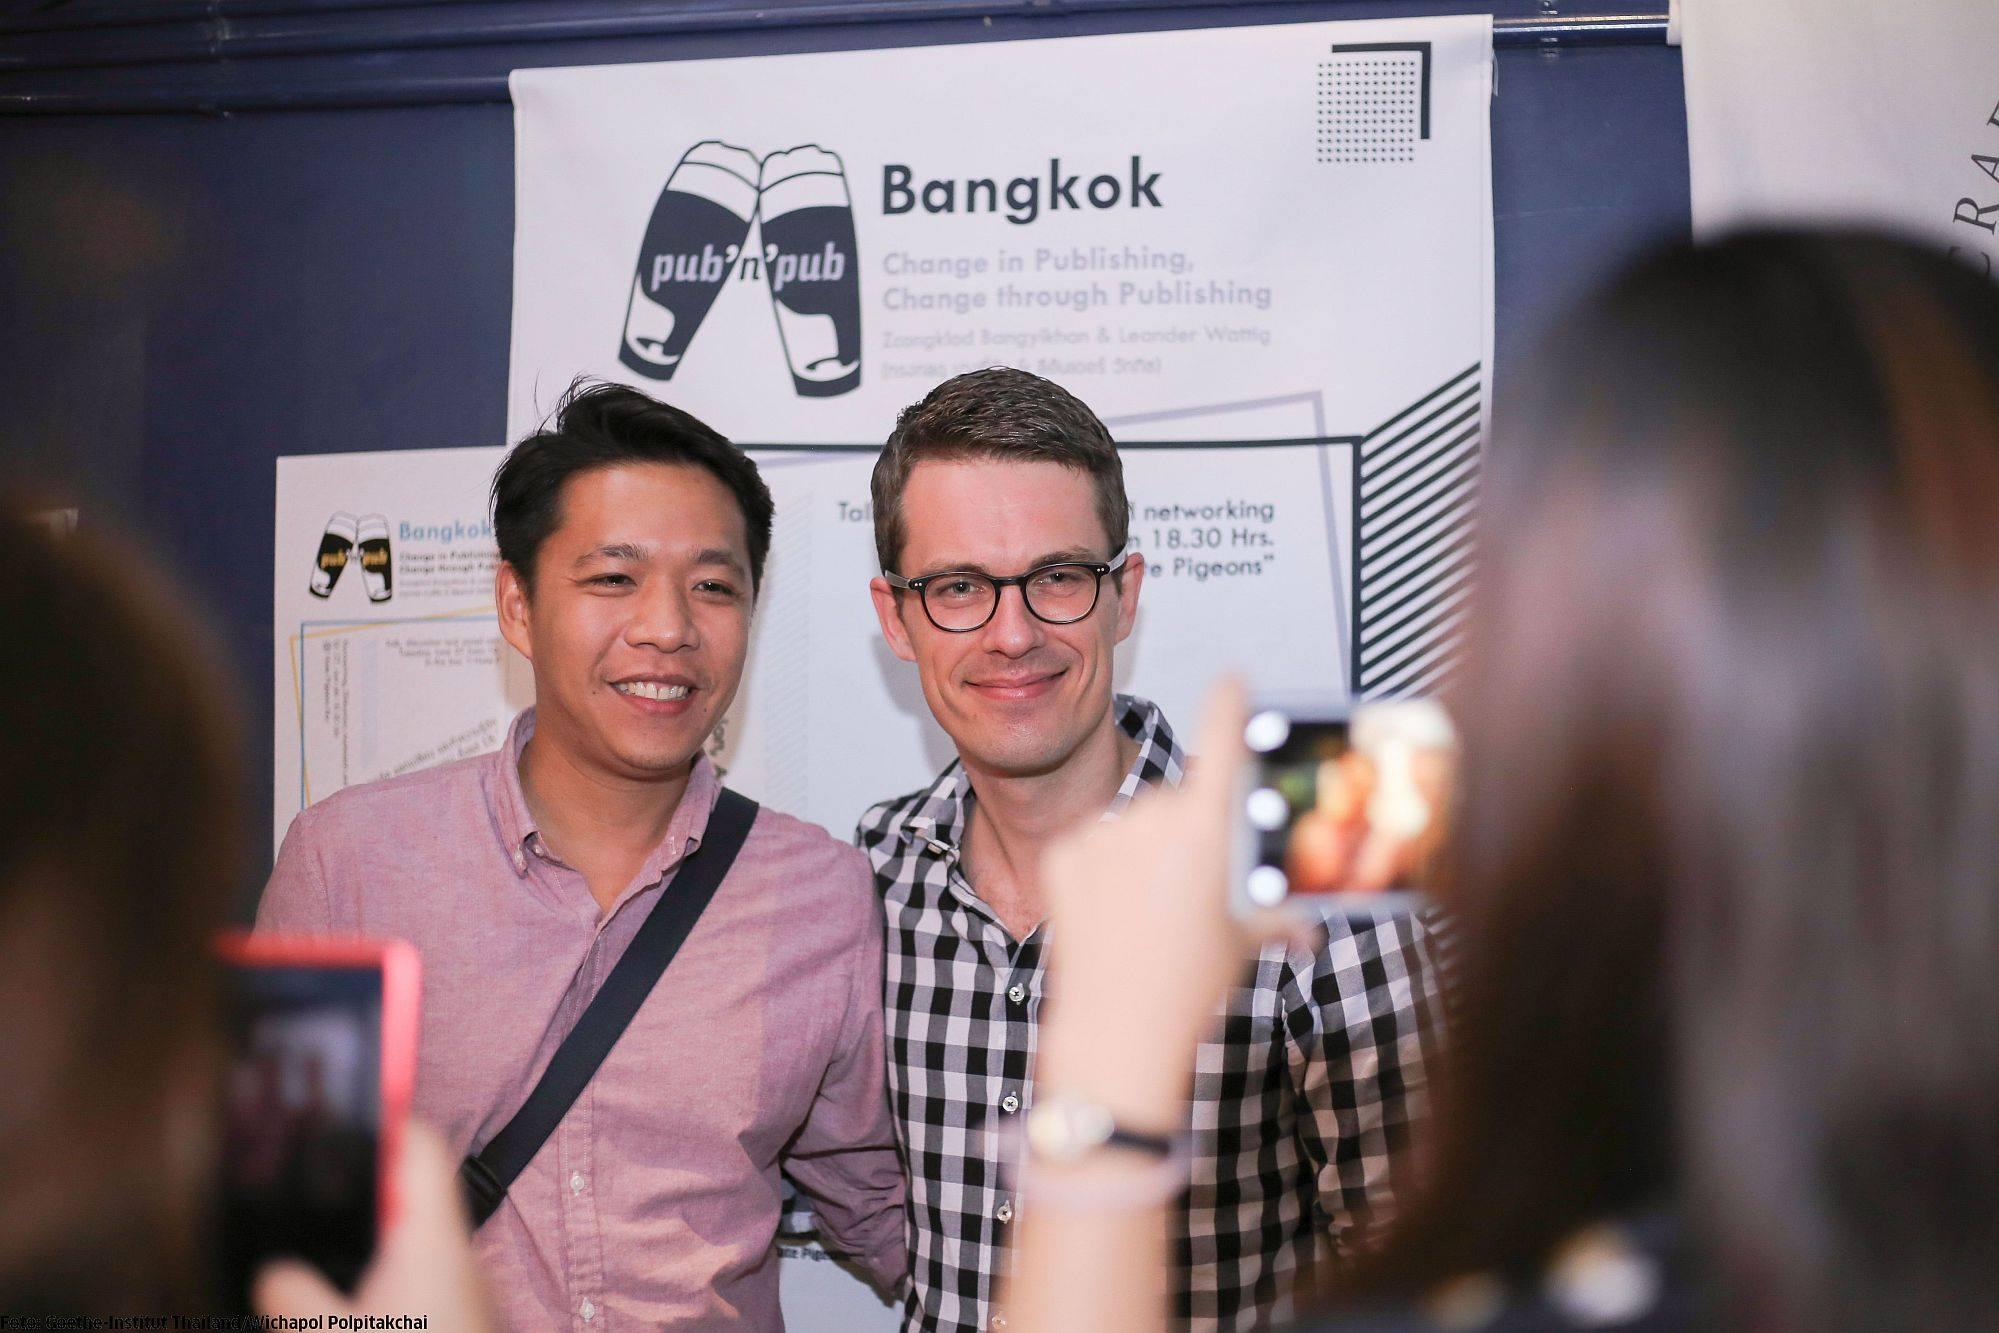 #pubnpub Bangkok